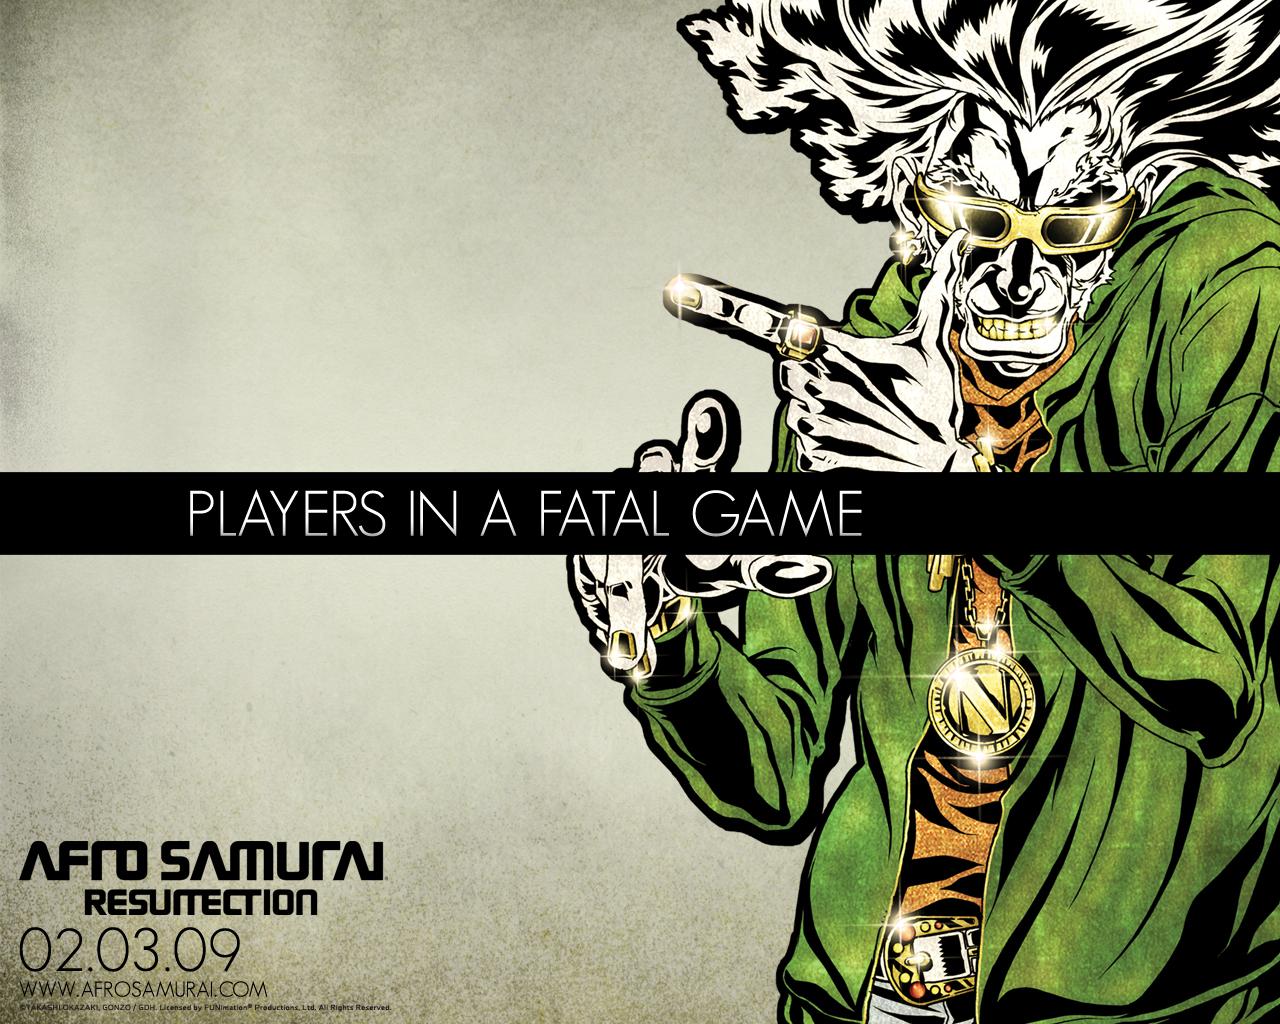 Picture Afrosamuray Resurrection Afro Samurai Resurrection film 1280x1024